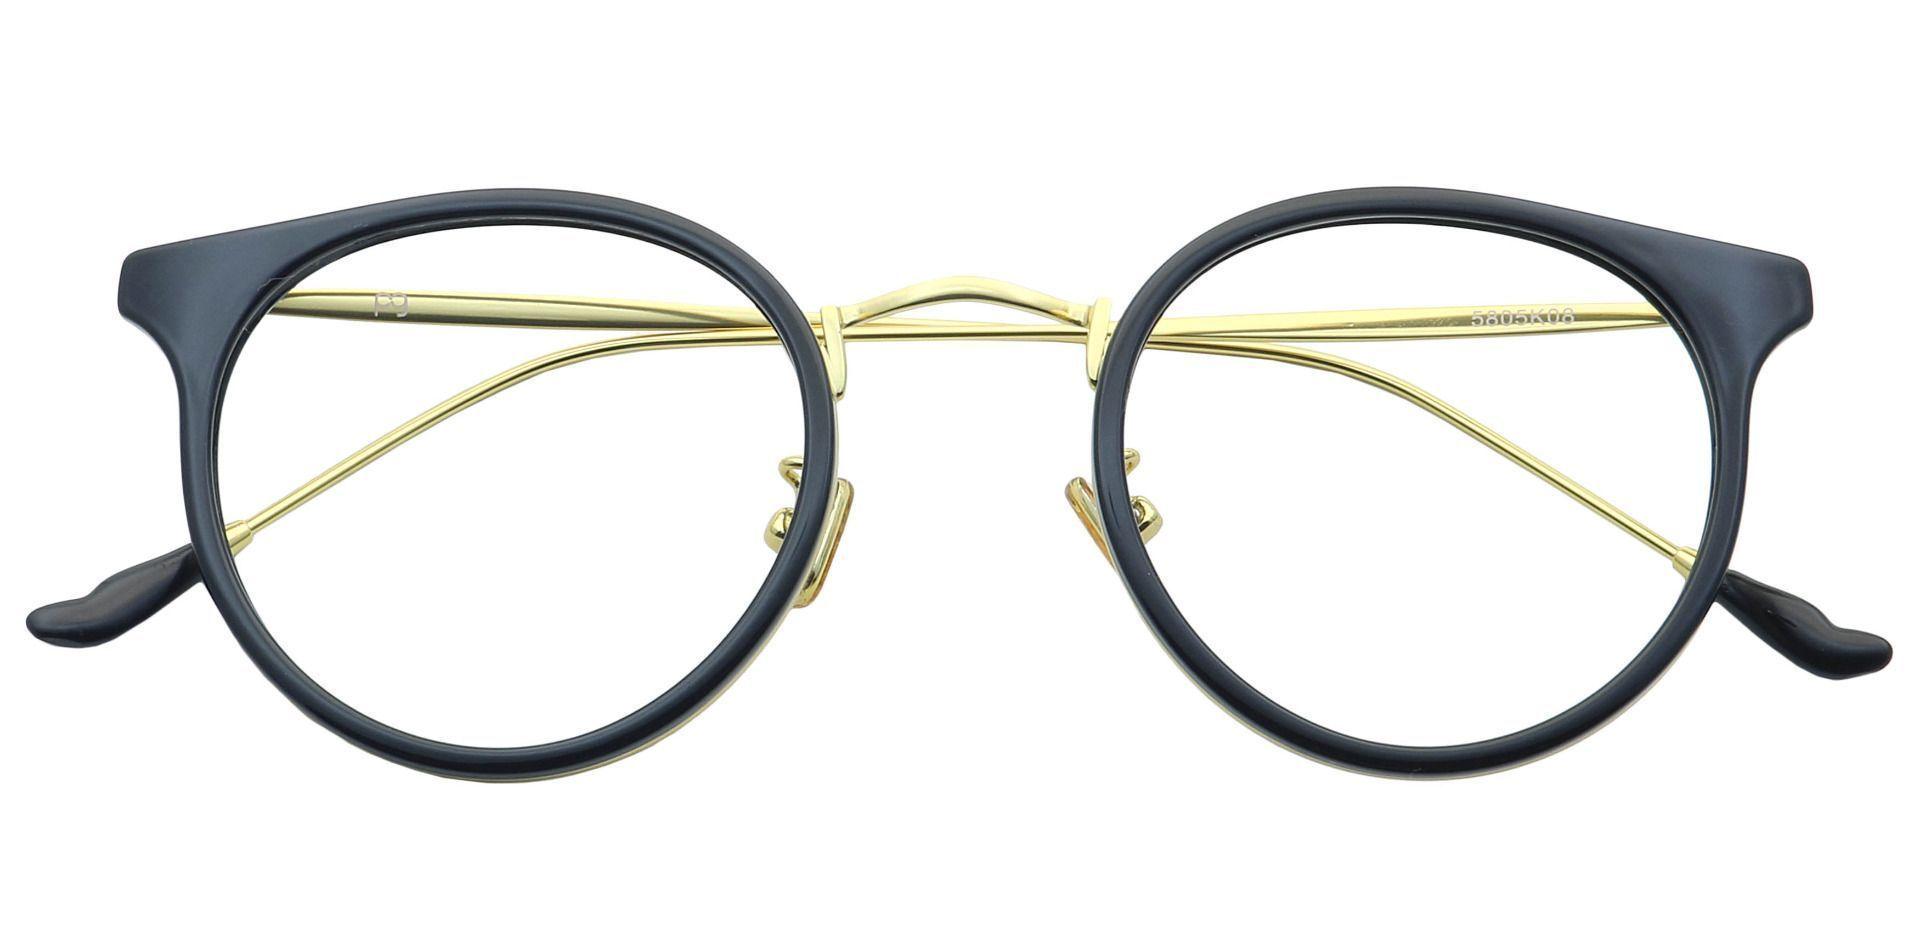 Schenley Round Non-Rx Glasses - Black